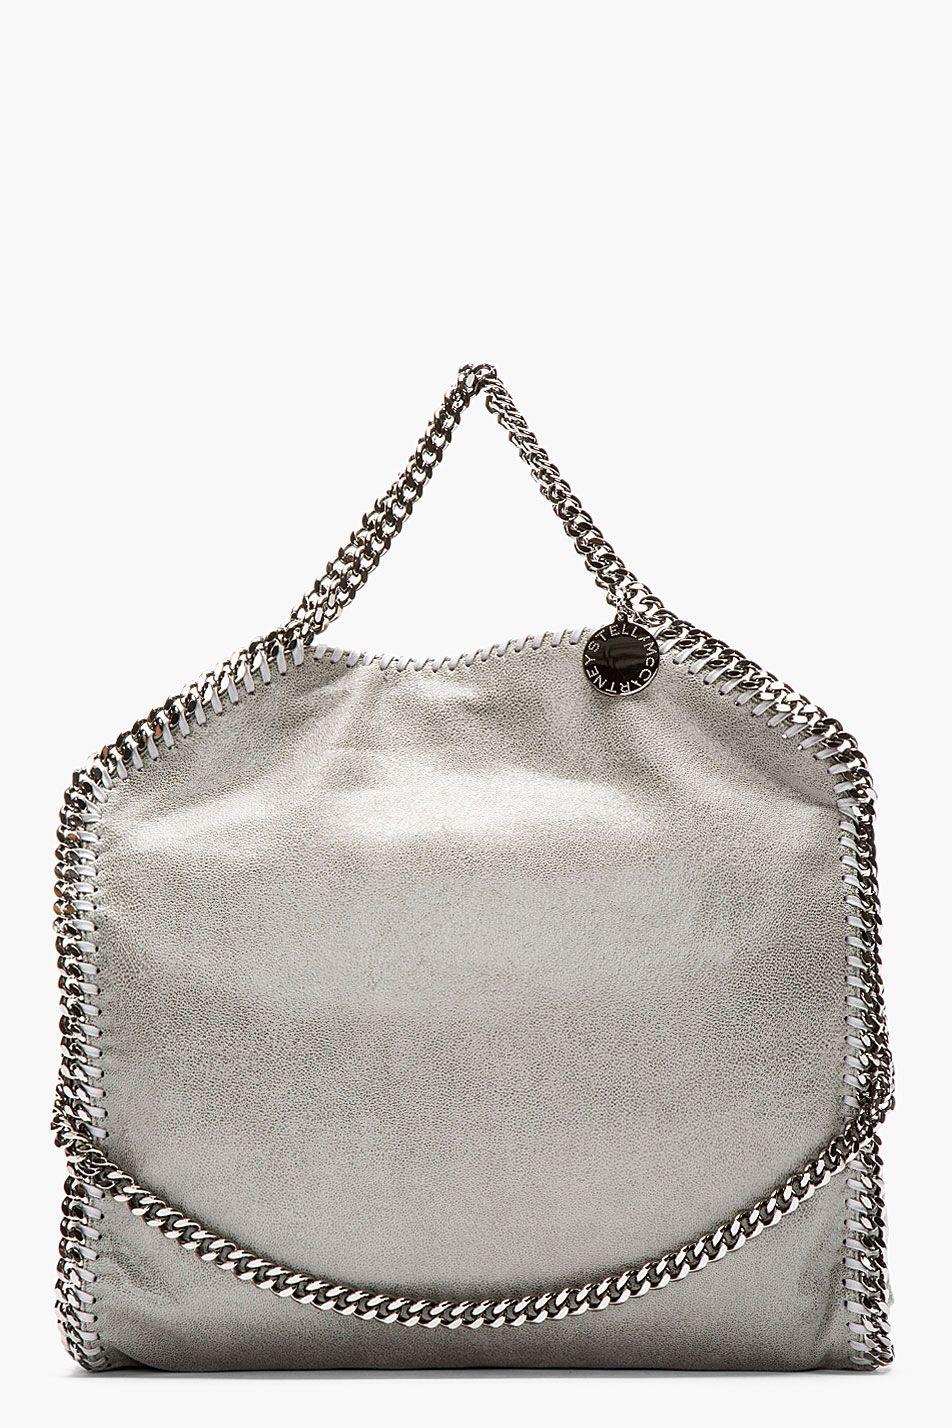 beda5e687fbf Stella Mccartney Light Grey Shaggy Deer Fold Over Falabella Bag ...